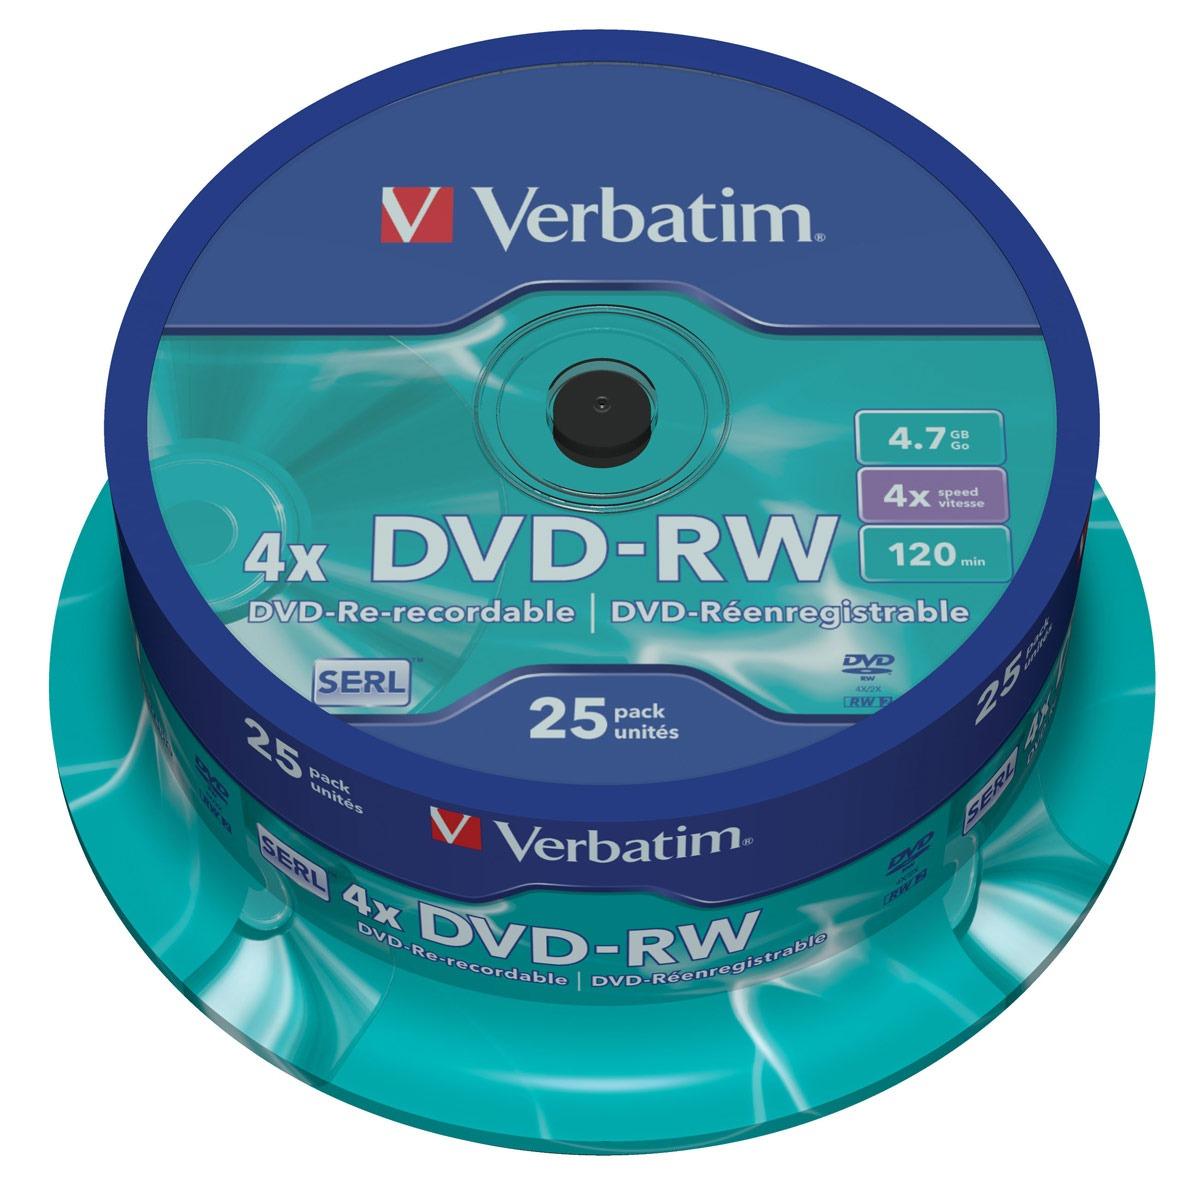 DVD Verbatim DVD-RW 4.7 Go certifié 4x (pack de 25, spindle) Verbatim DVD-RW 4.7 Go certifié 4x (pack de 25, spindle)